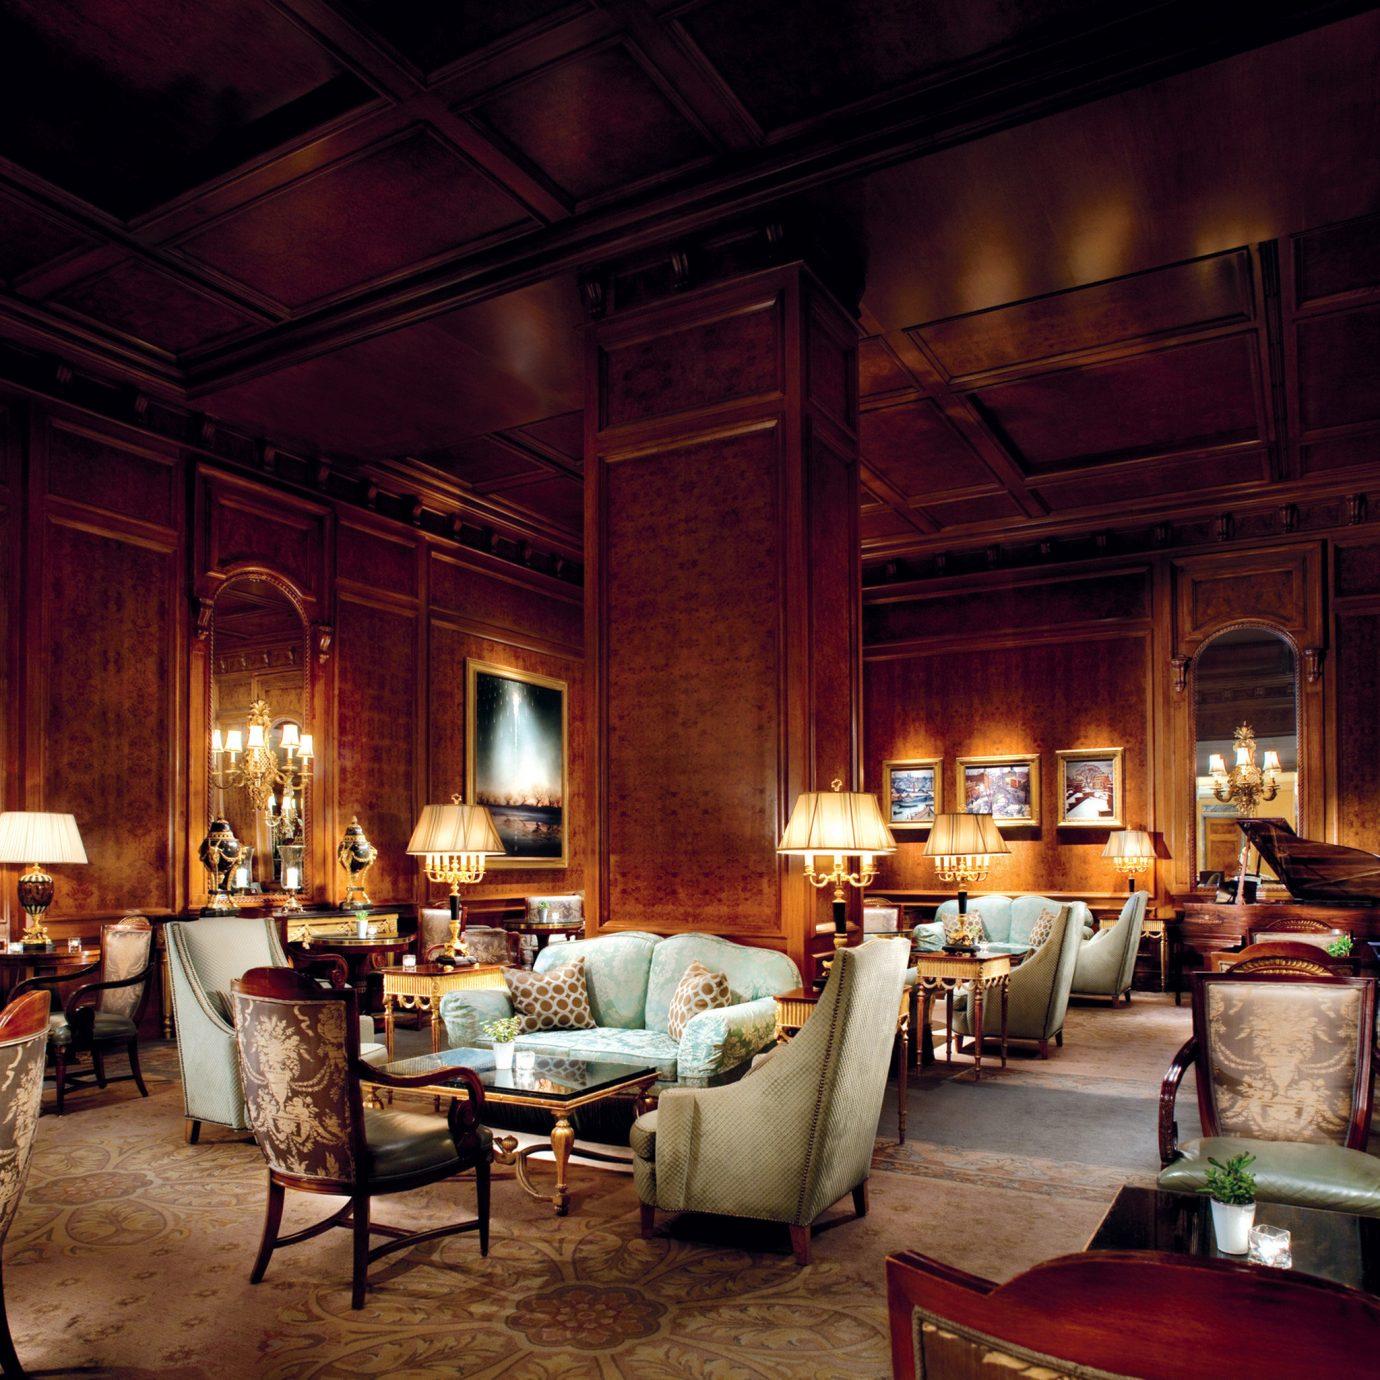 Elegant Fireplace Hotels Lounge Luxury lighting home living room mansion restaurant